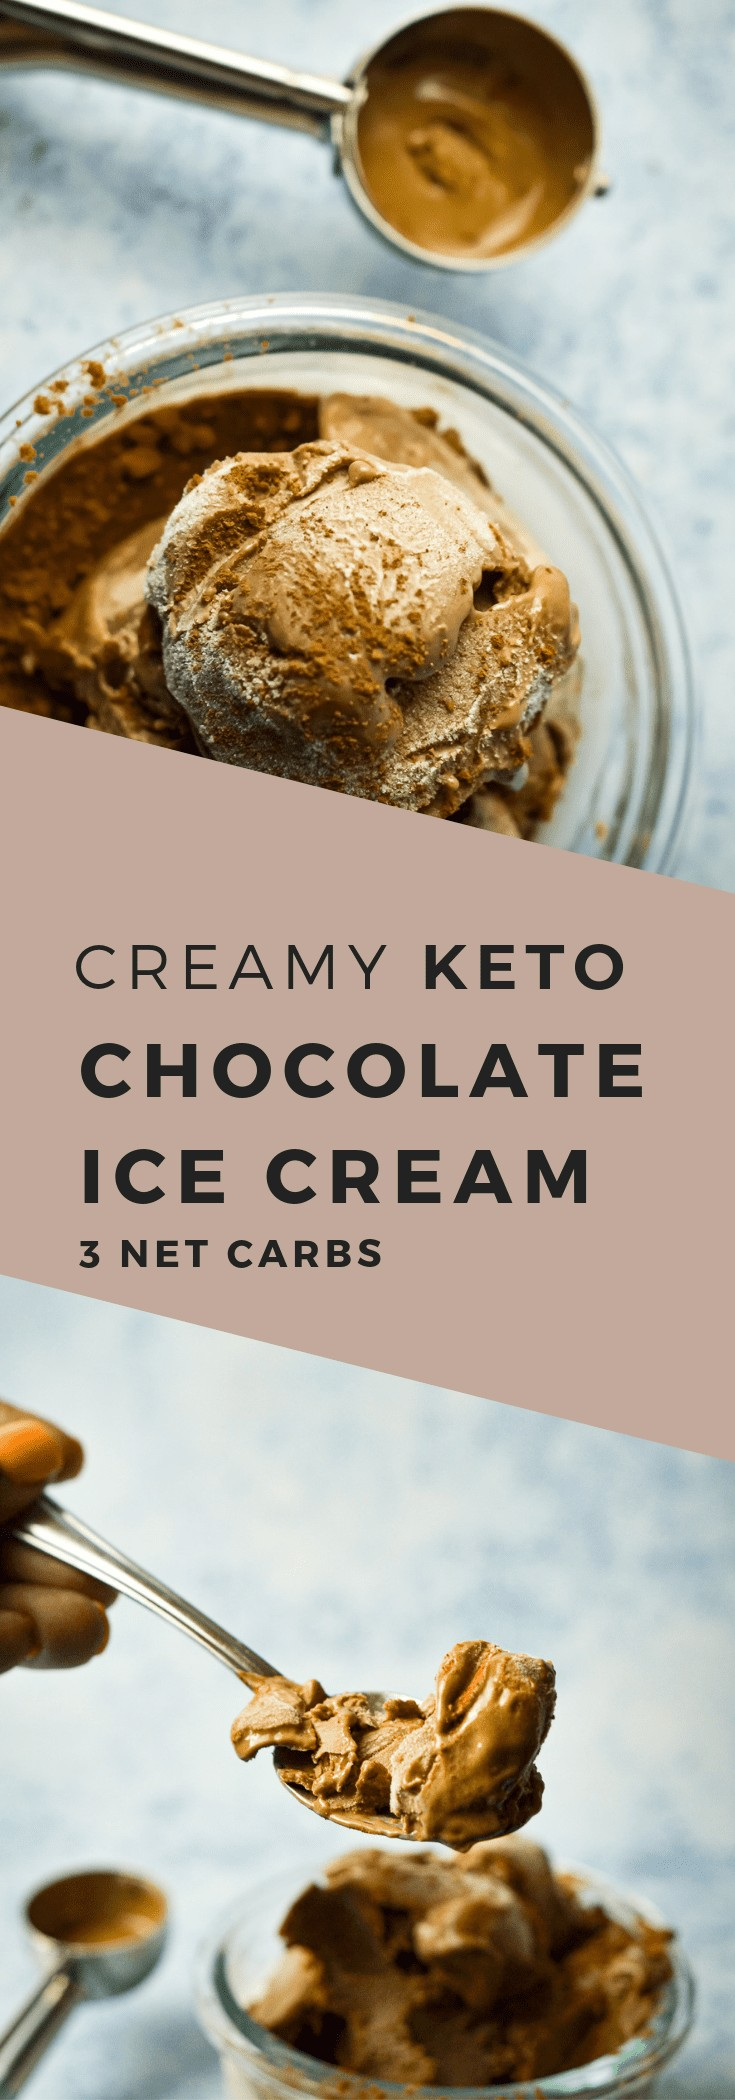 Keto/Low Carb Chocolate Ice cream